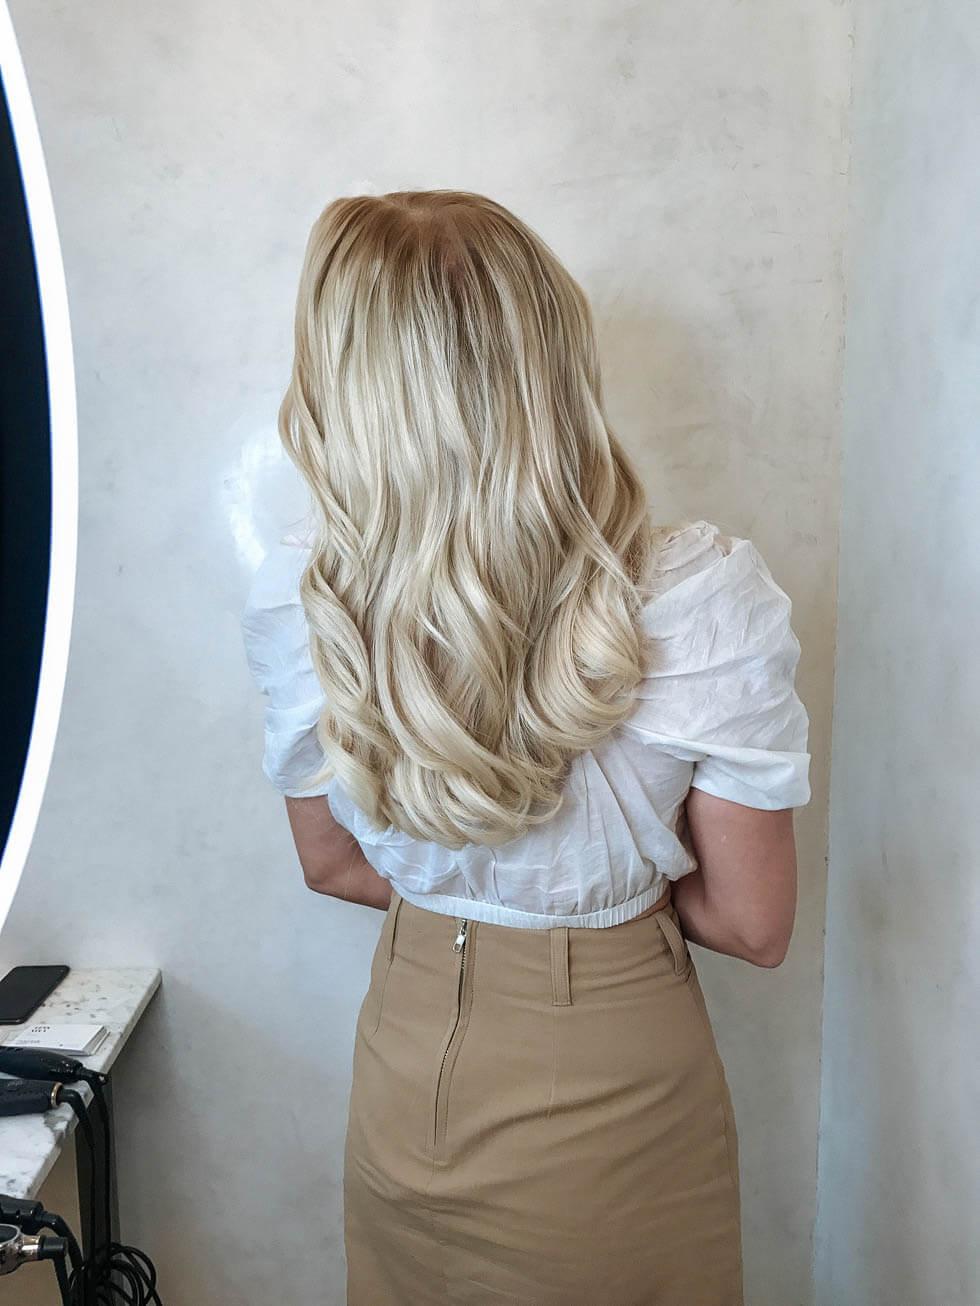 Hairtalk-Hairband sa faster man det